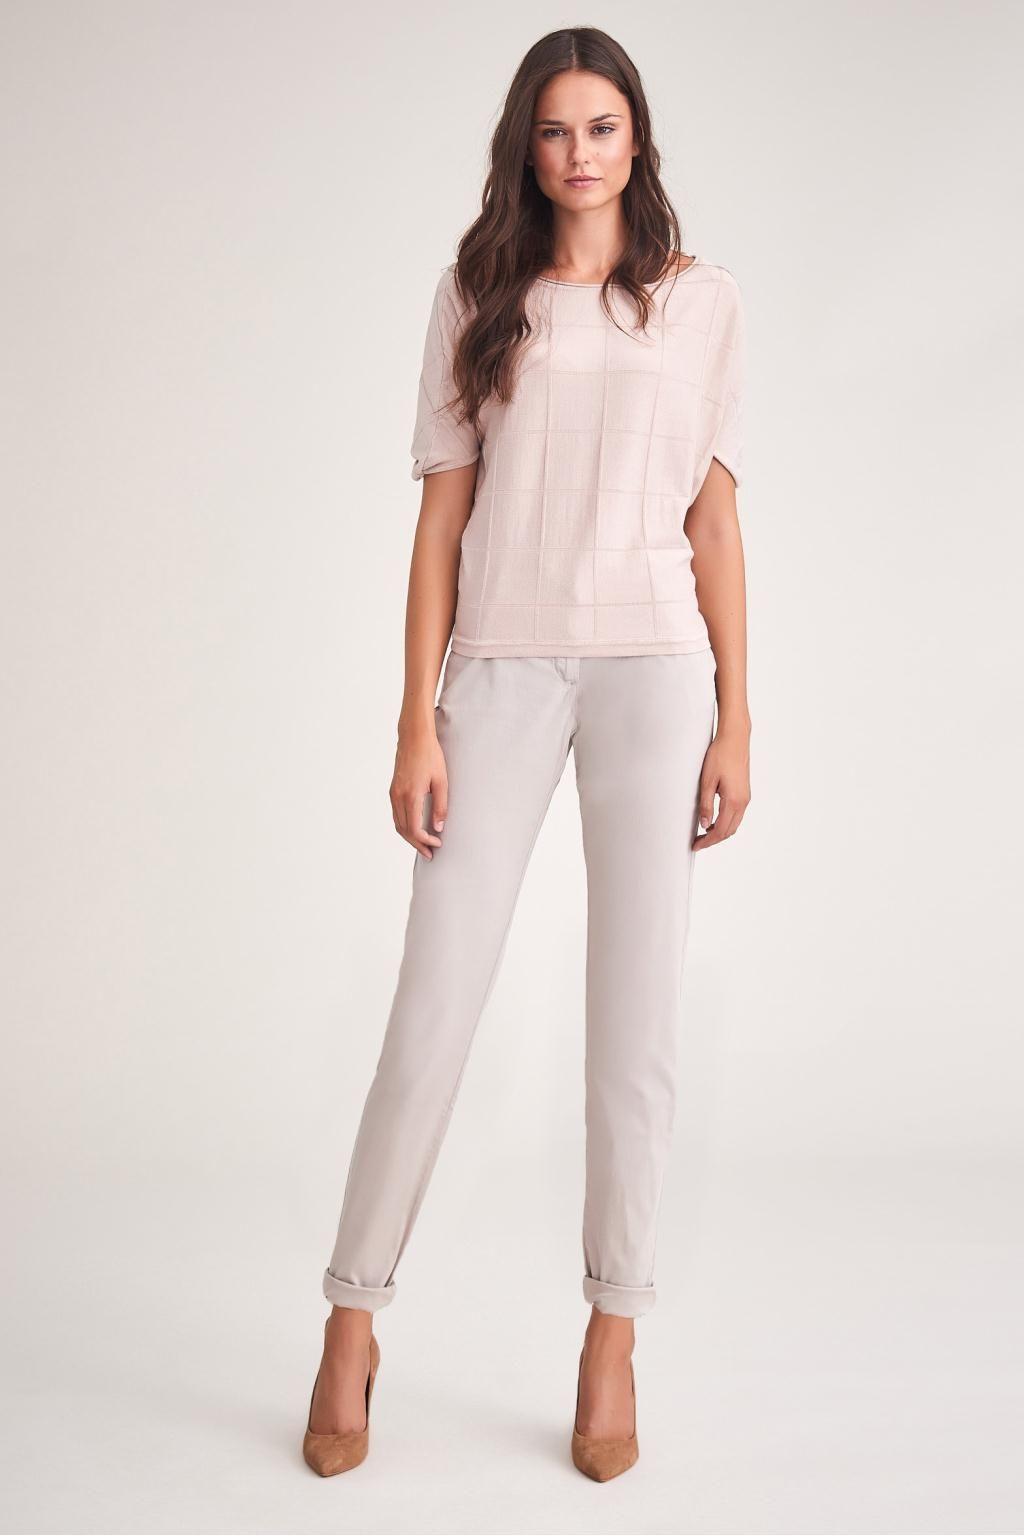 267191b735 Modne i klasyczne spodnie damskie